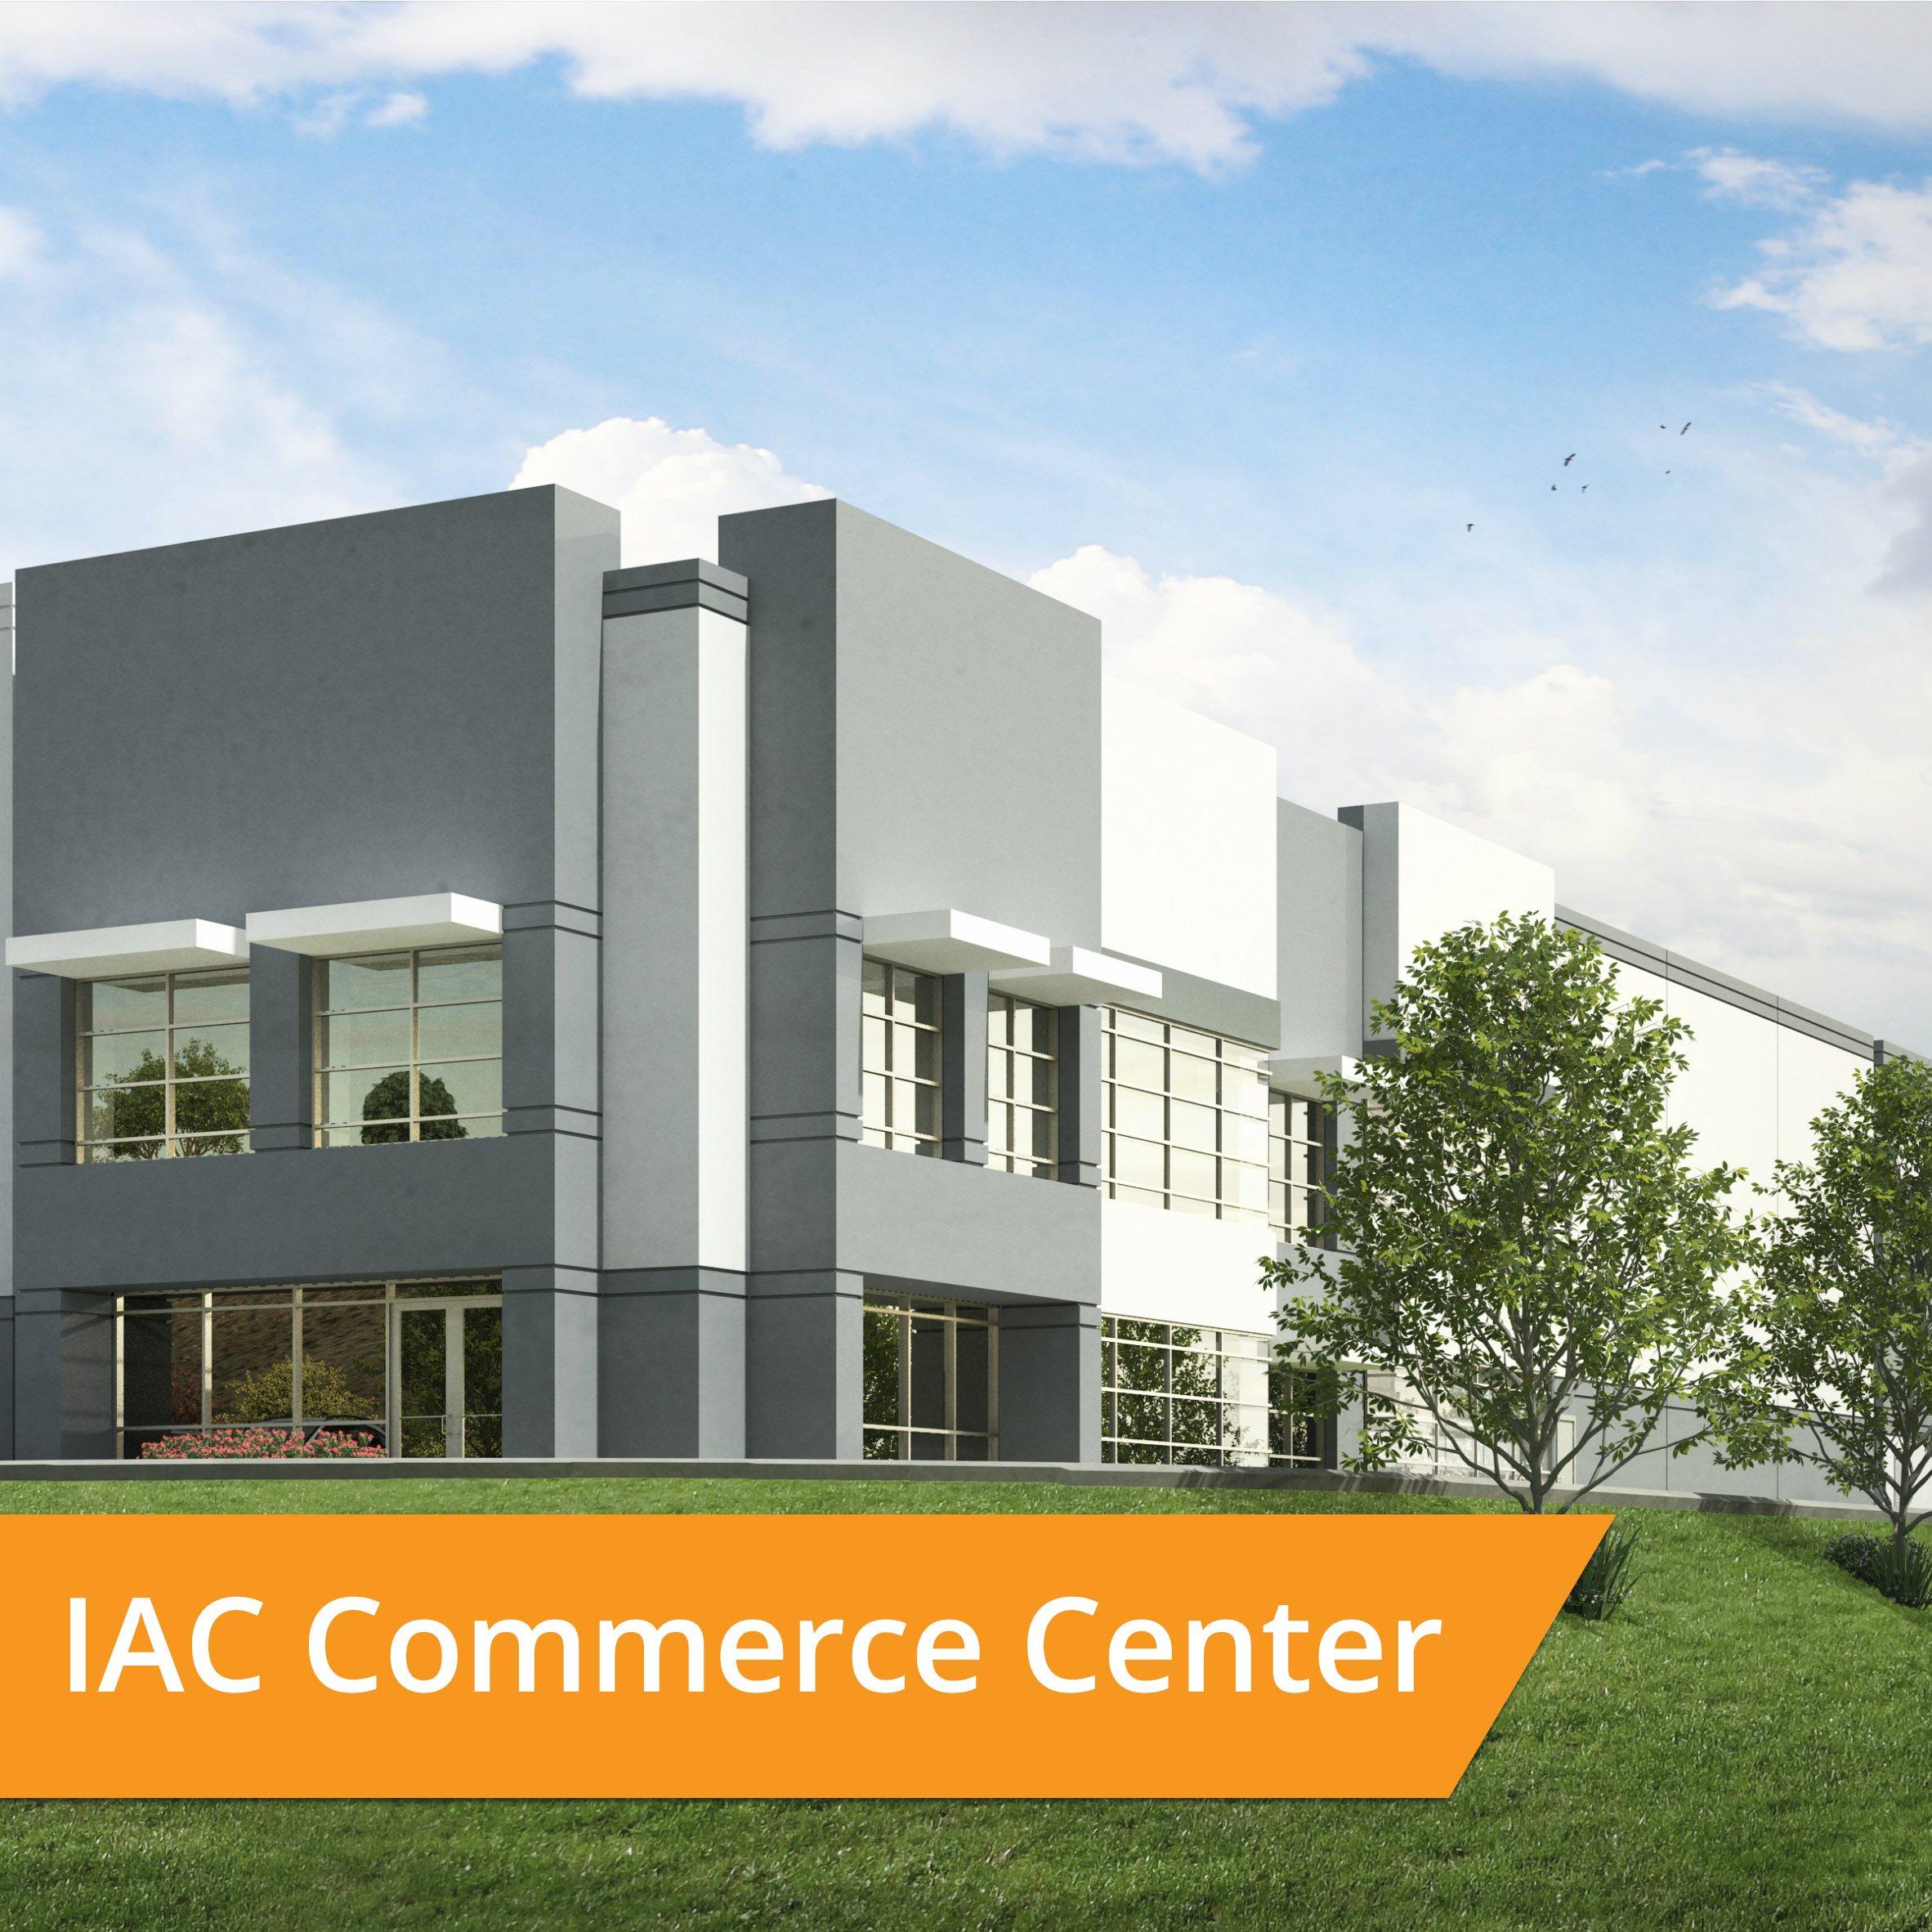 IAC Commerce Center in Santa Clarita